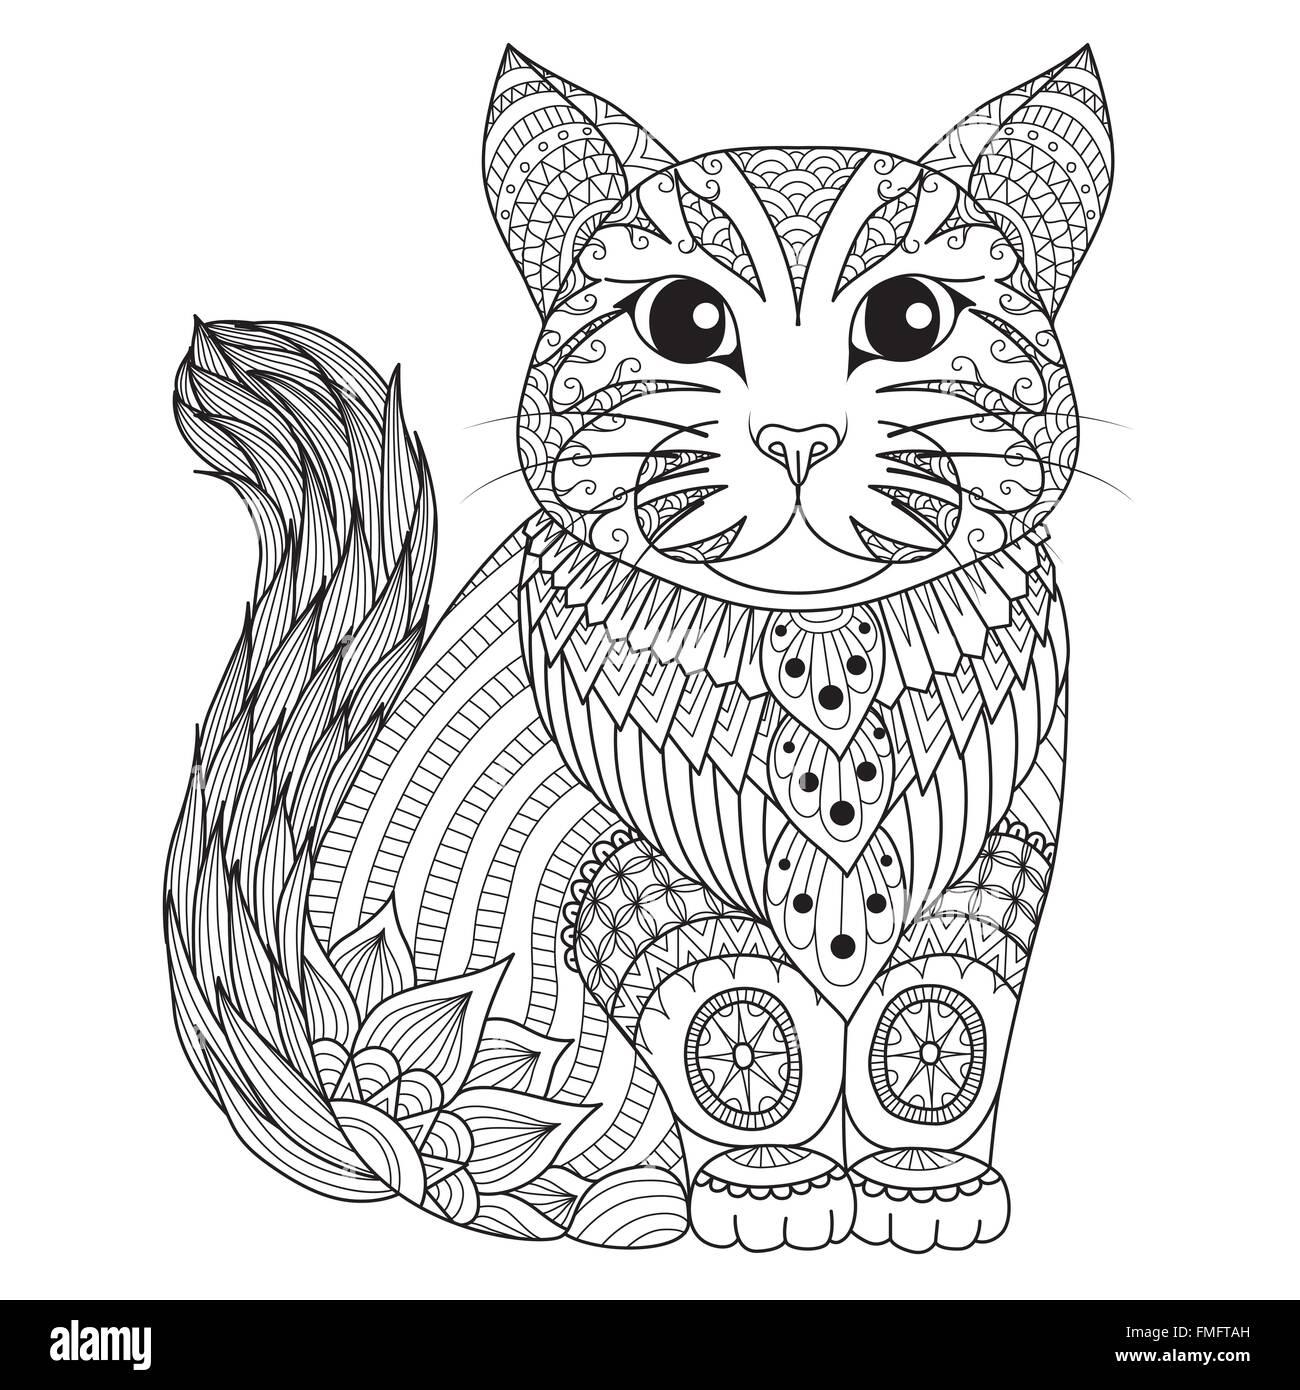 Animal Zentangles: Digital Version Adult Coloring Book – Adult ... | 1390x1300